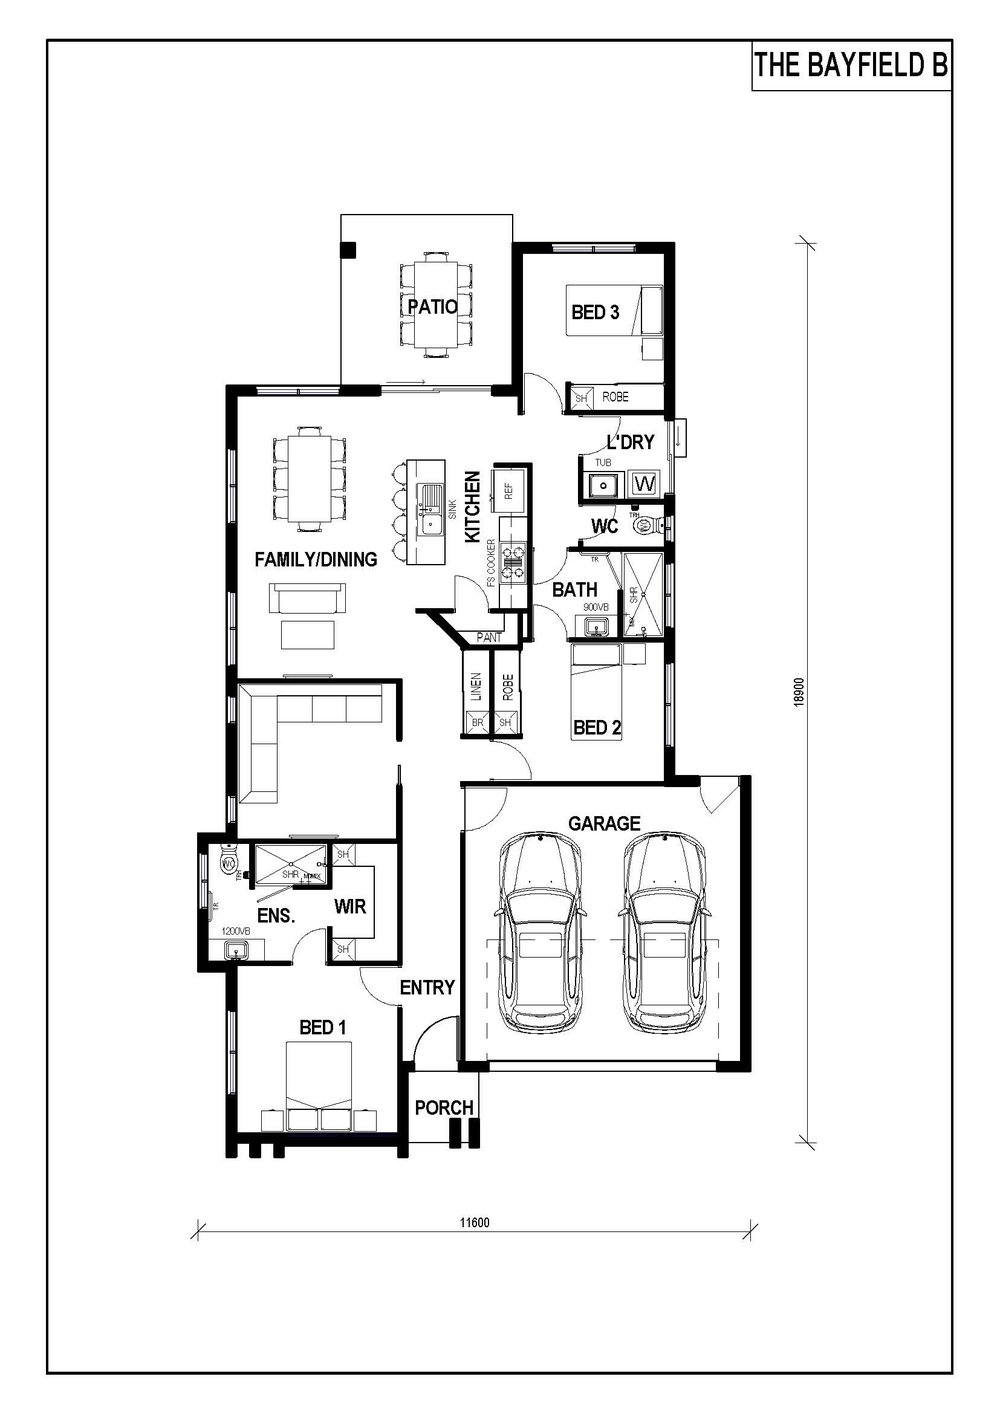 BAYFIELD B - Floor Plan.jpg